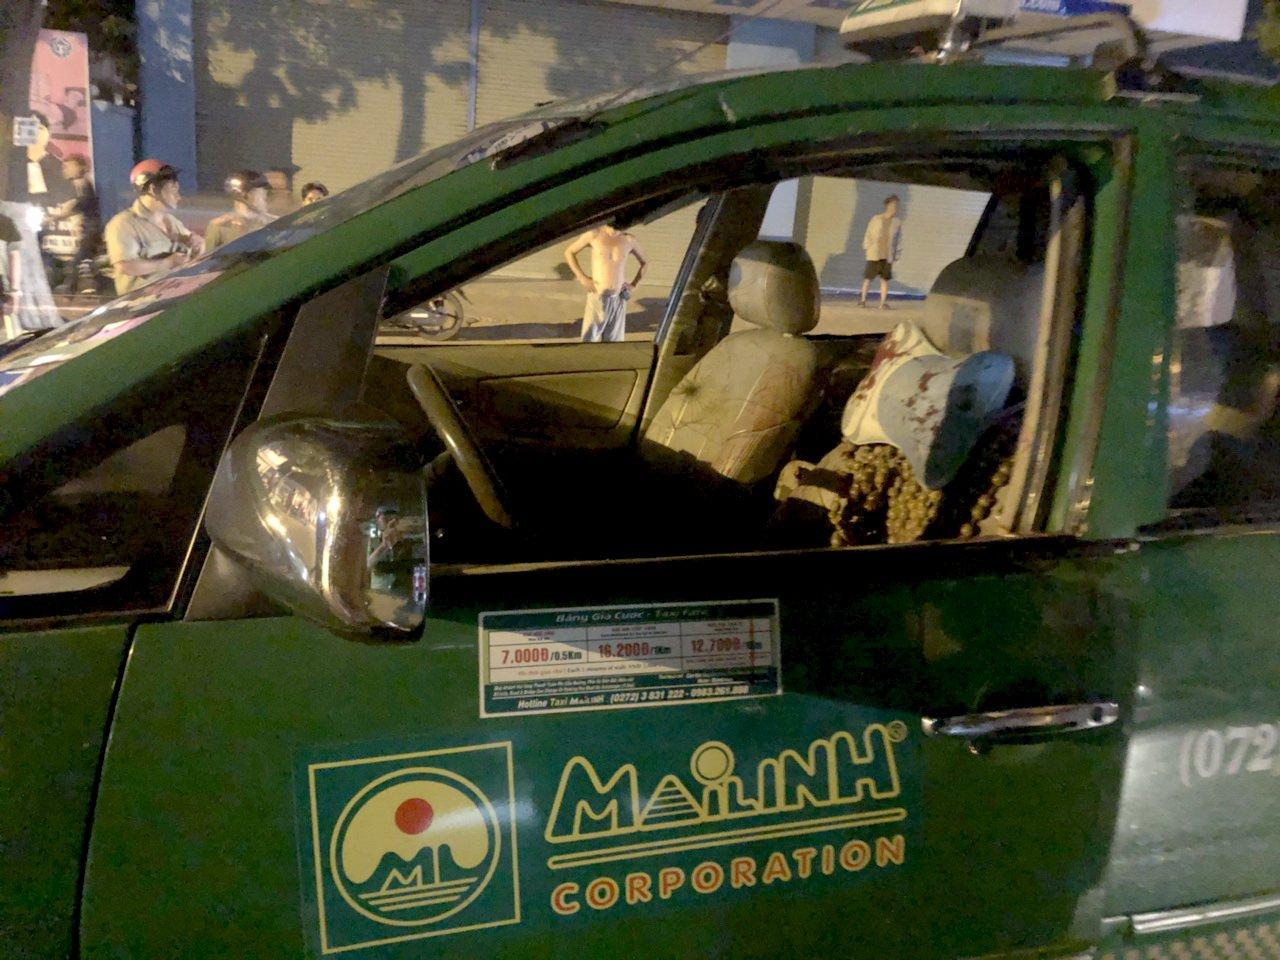 Nhom con do chan taxi chem hanh khach, ban tai xe hinh anh 3